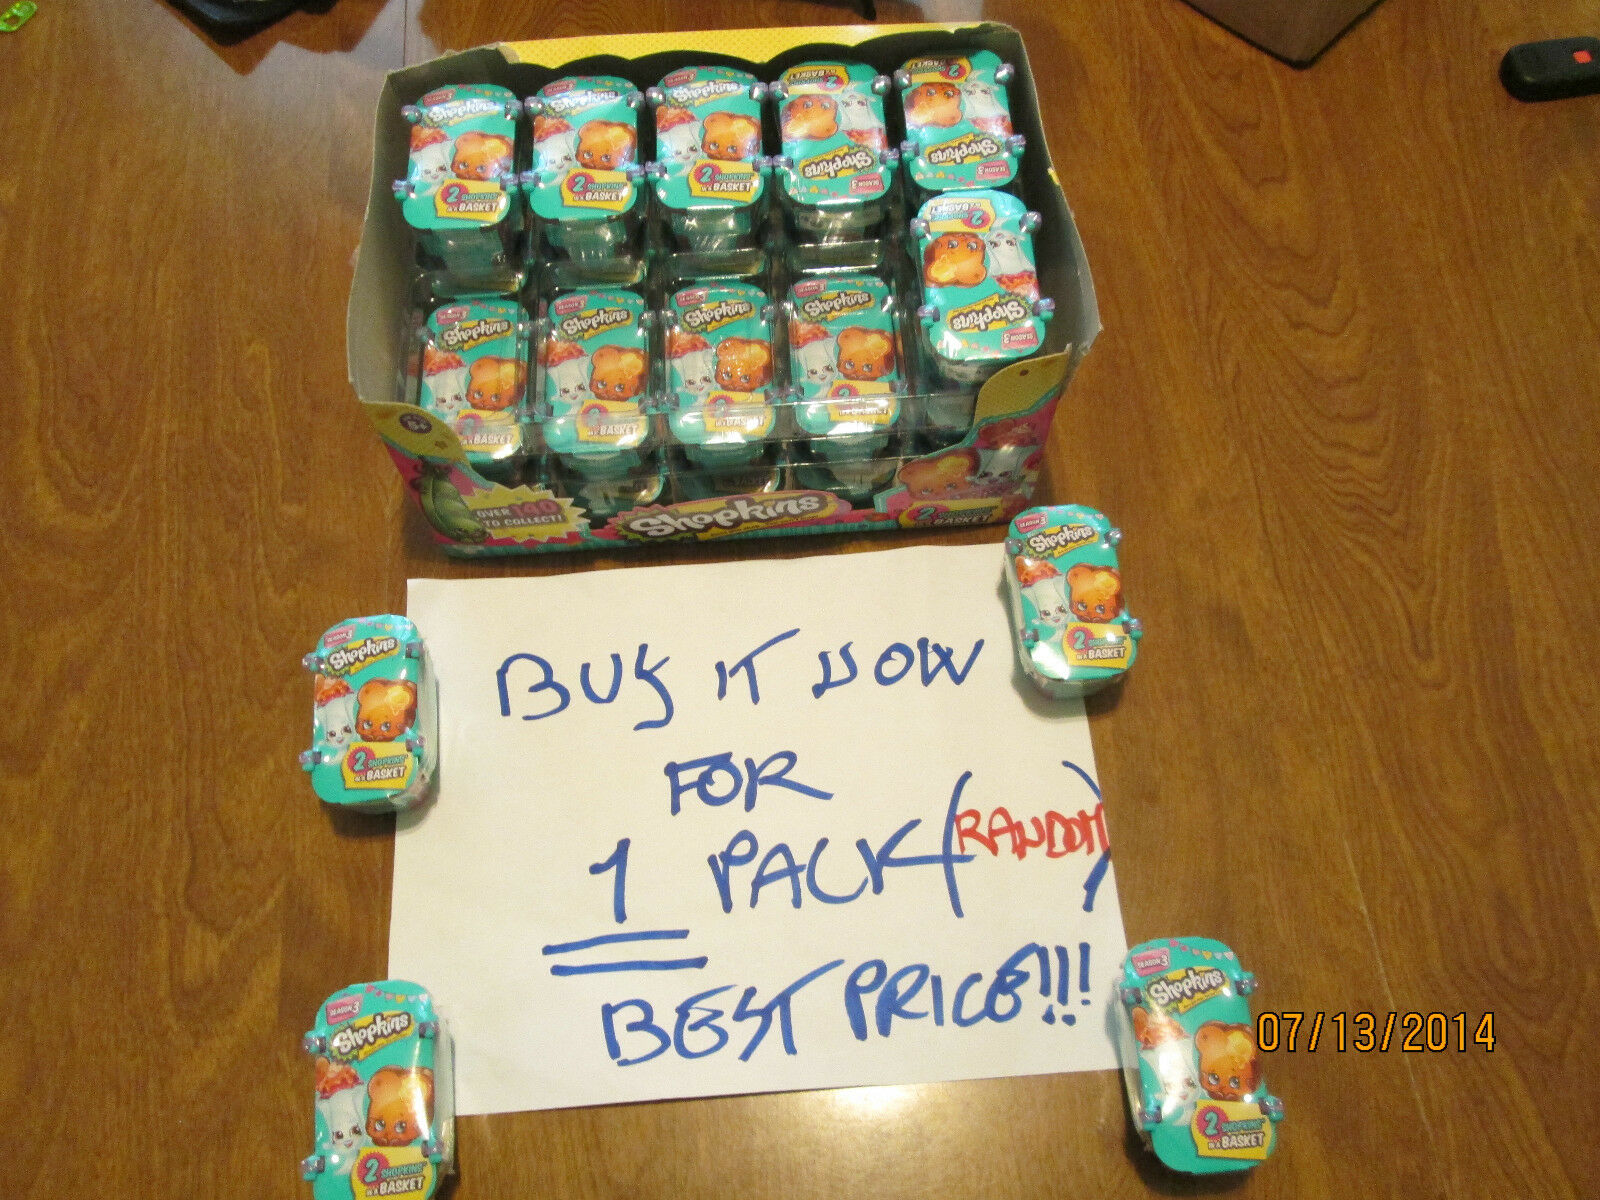 SHOPKINS Season 3 BLIND BASKET HIDDEN 2 Pack For Baby Ultra Rarelimited Edition